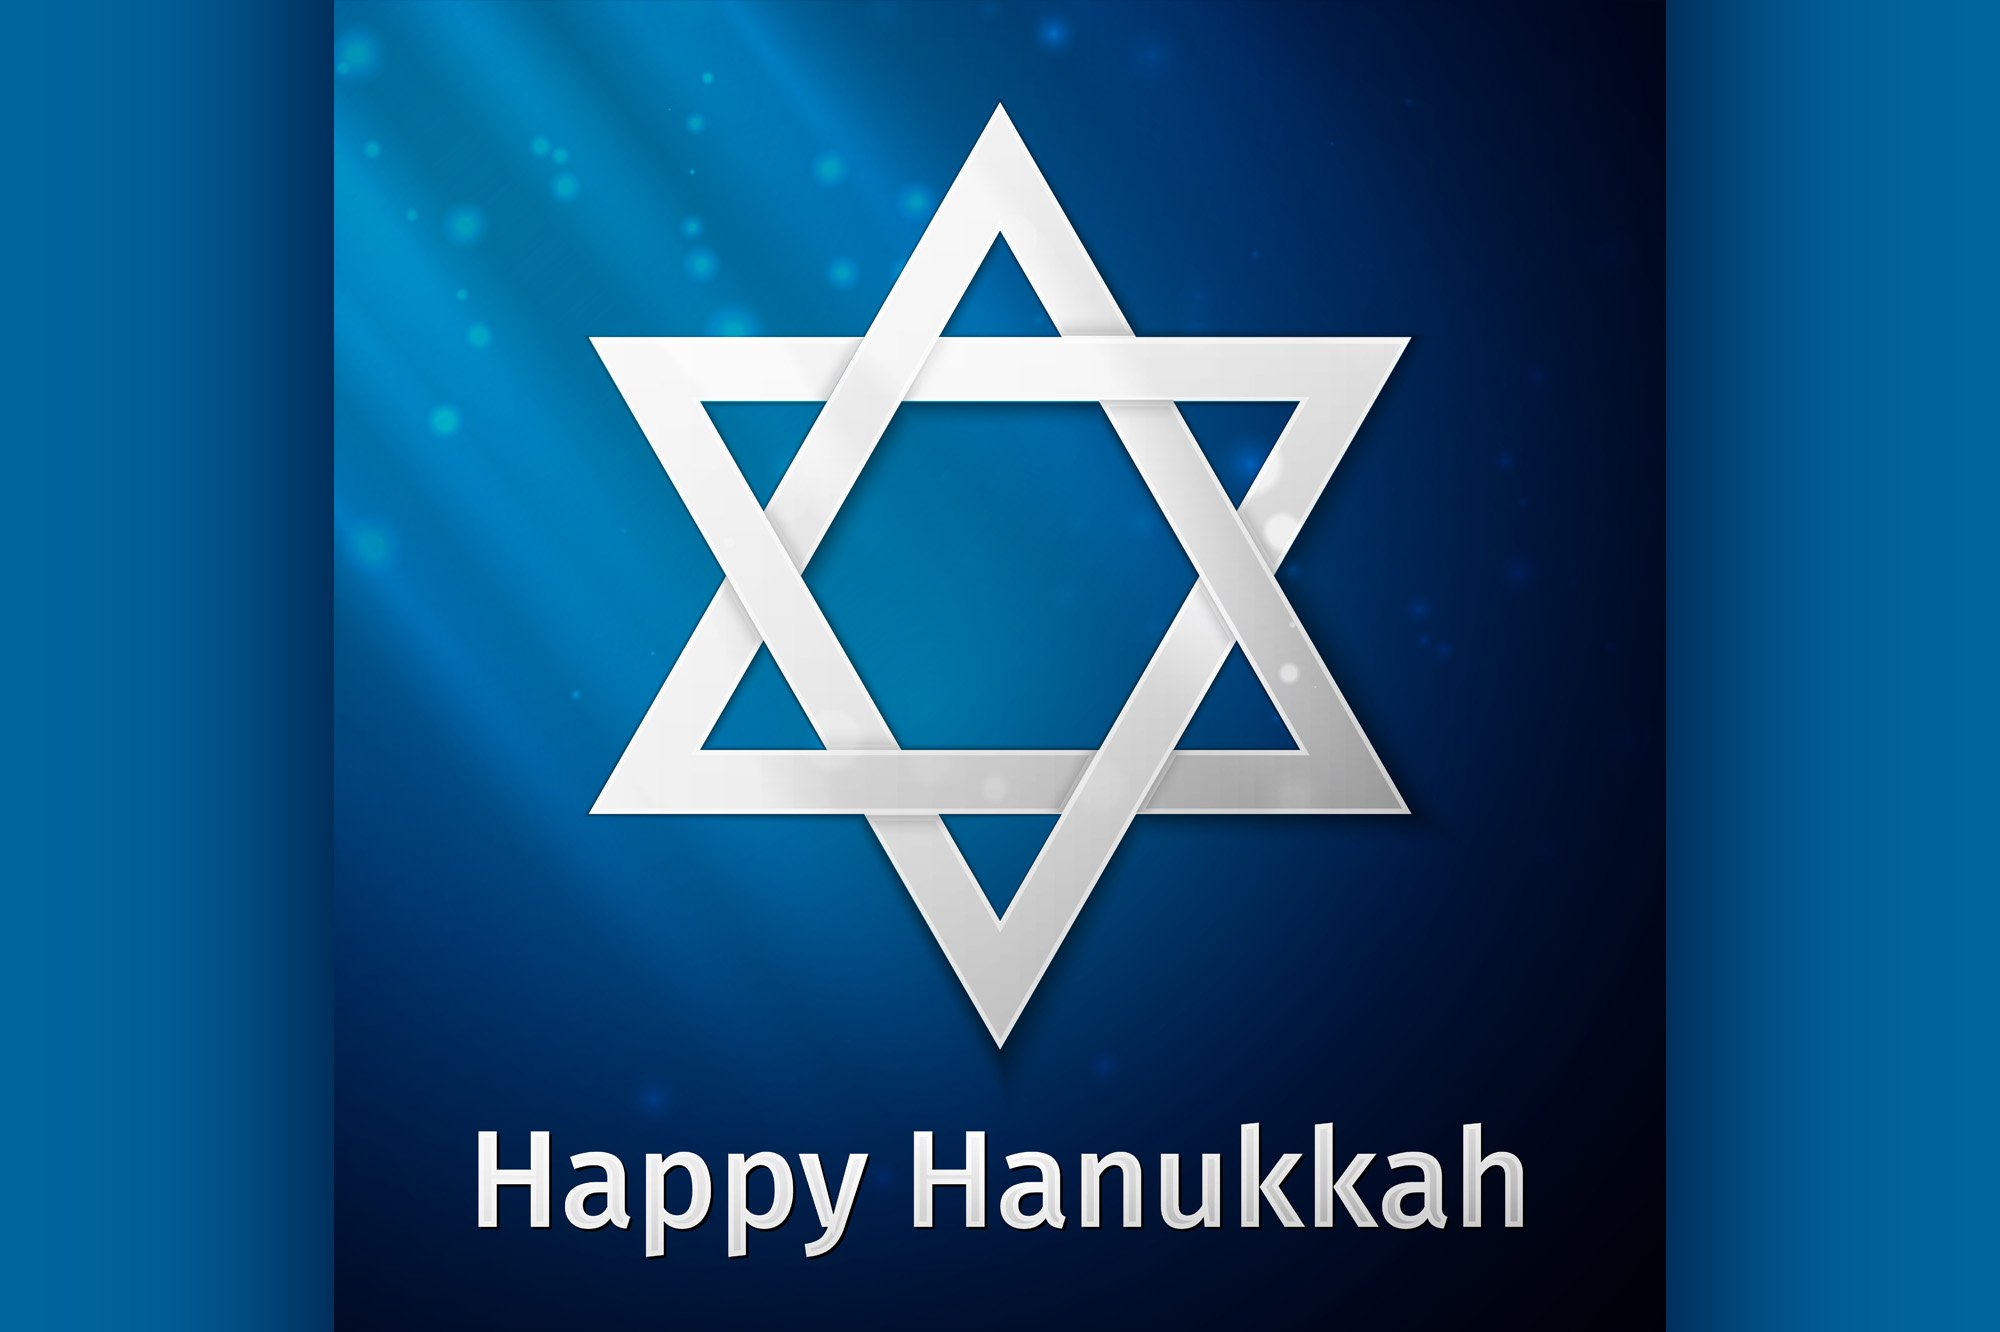 Happy Hanukkah holiday background example image 1